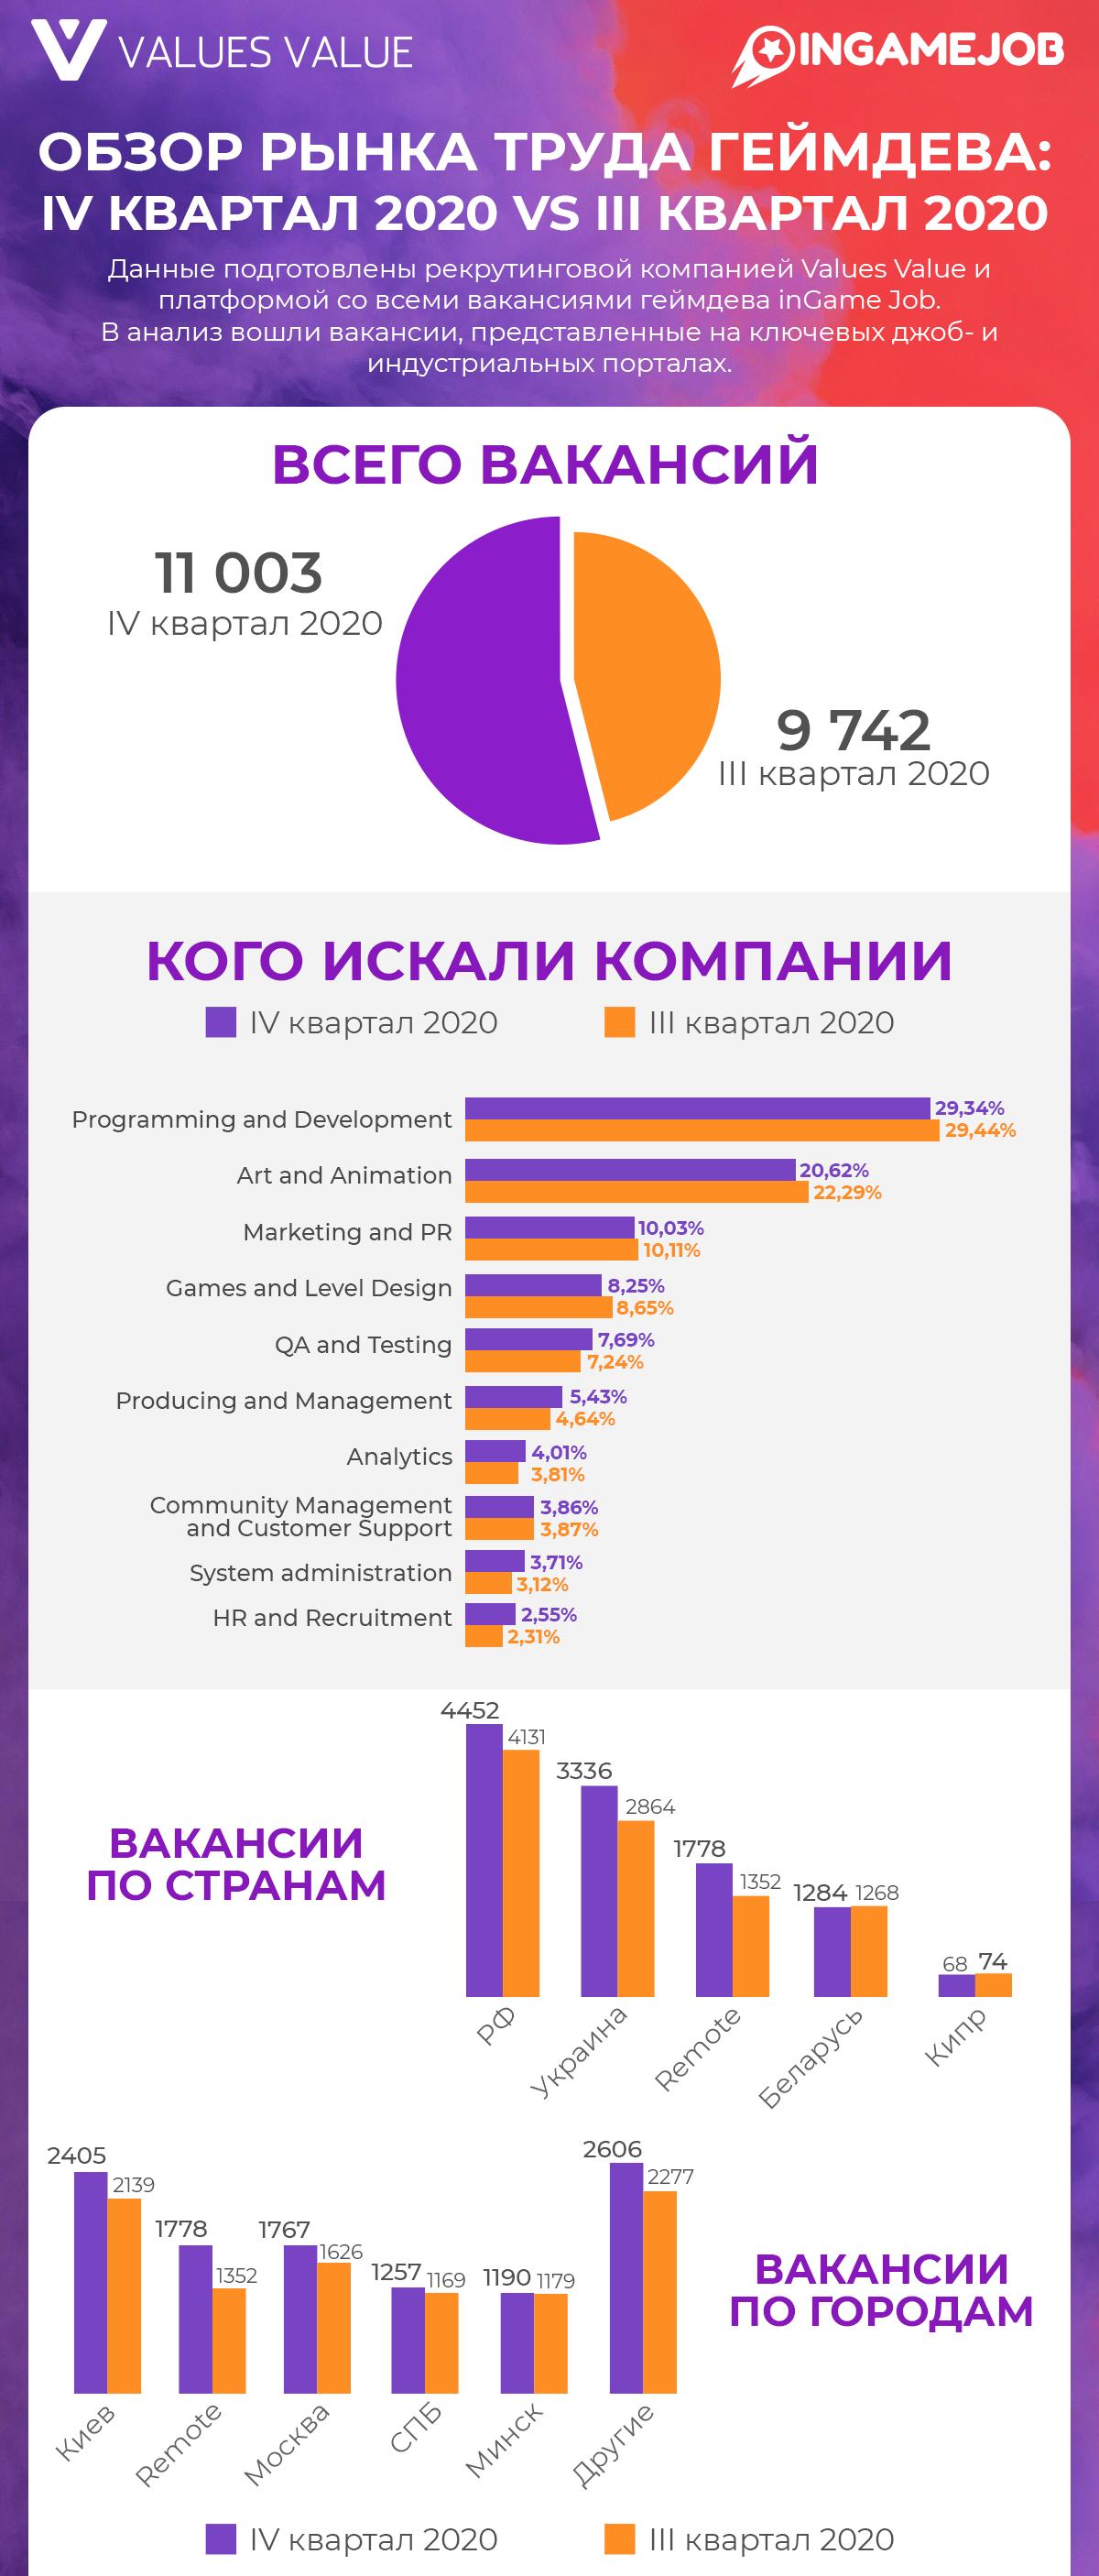 Обзор рынка труда геймдева (IV квартал 2020г. vs III квартал 2020г.) - Boost InGame Job